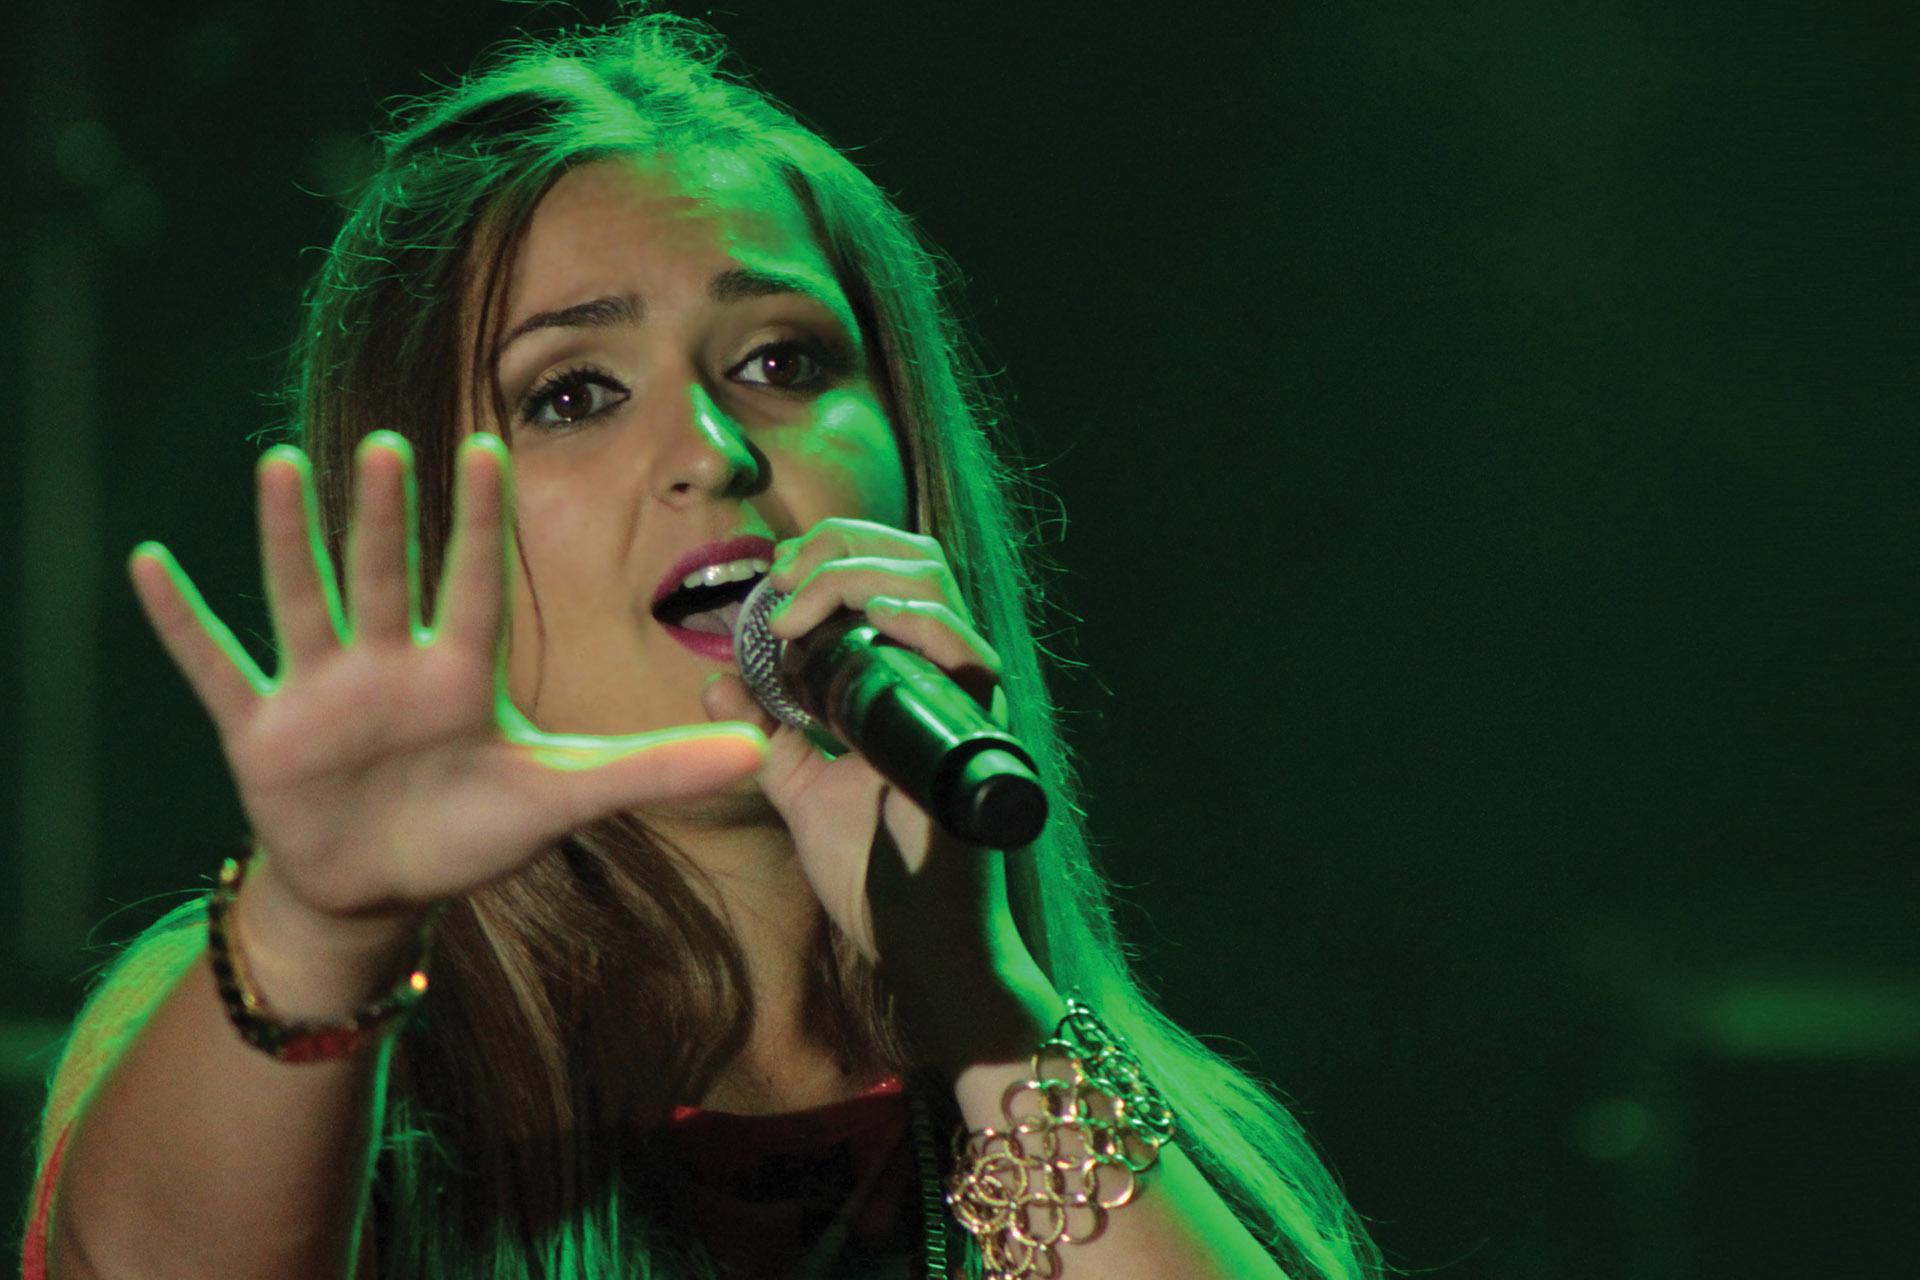 InterContinental Music Awards, artist, singing